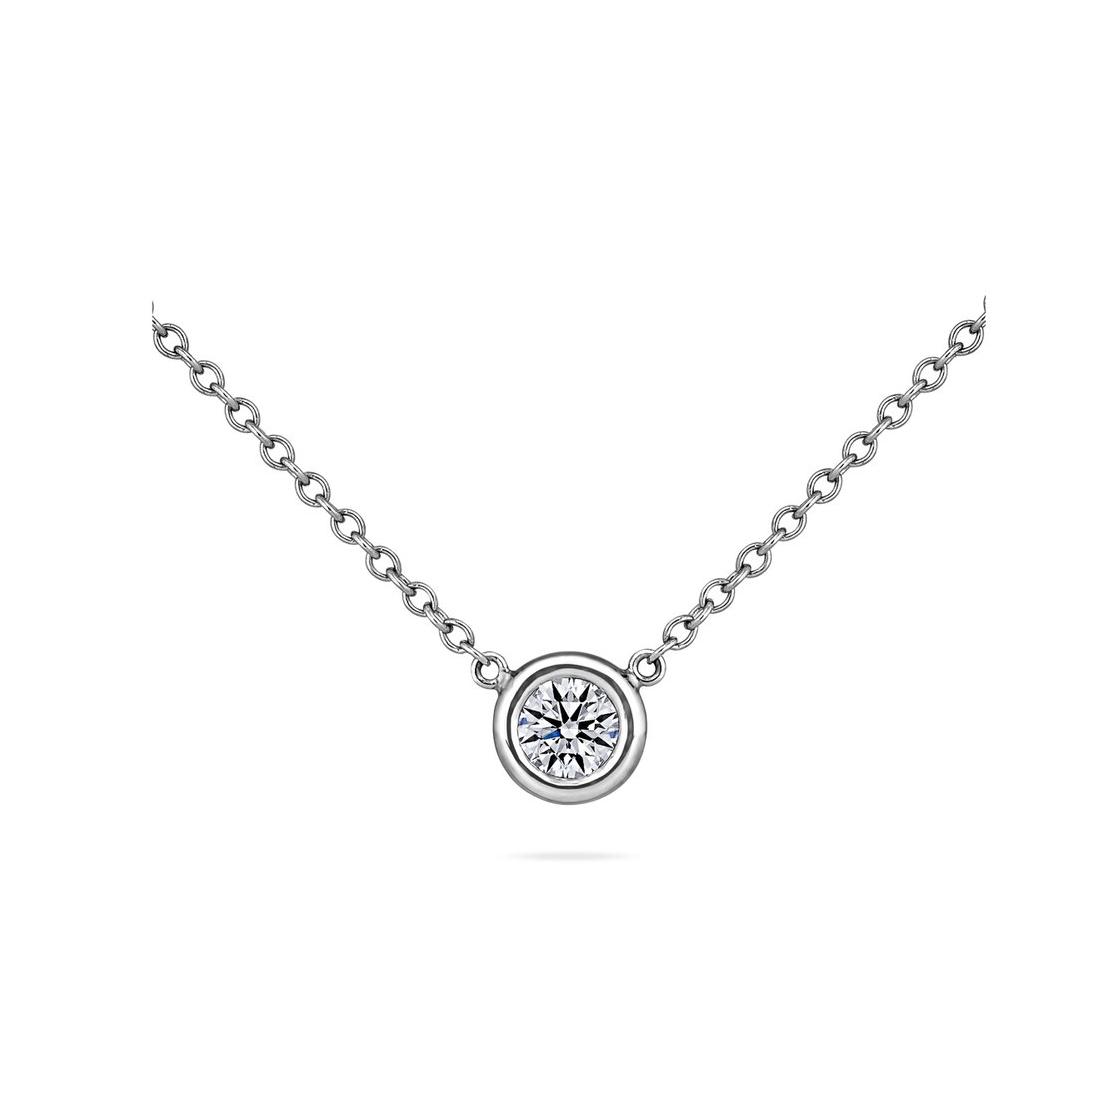 Designer Necklaces Chain Necklaces Pendants More Steven Fox Jewelry